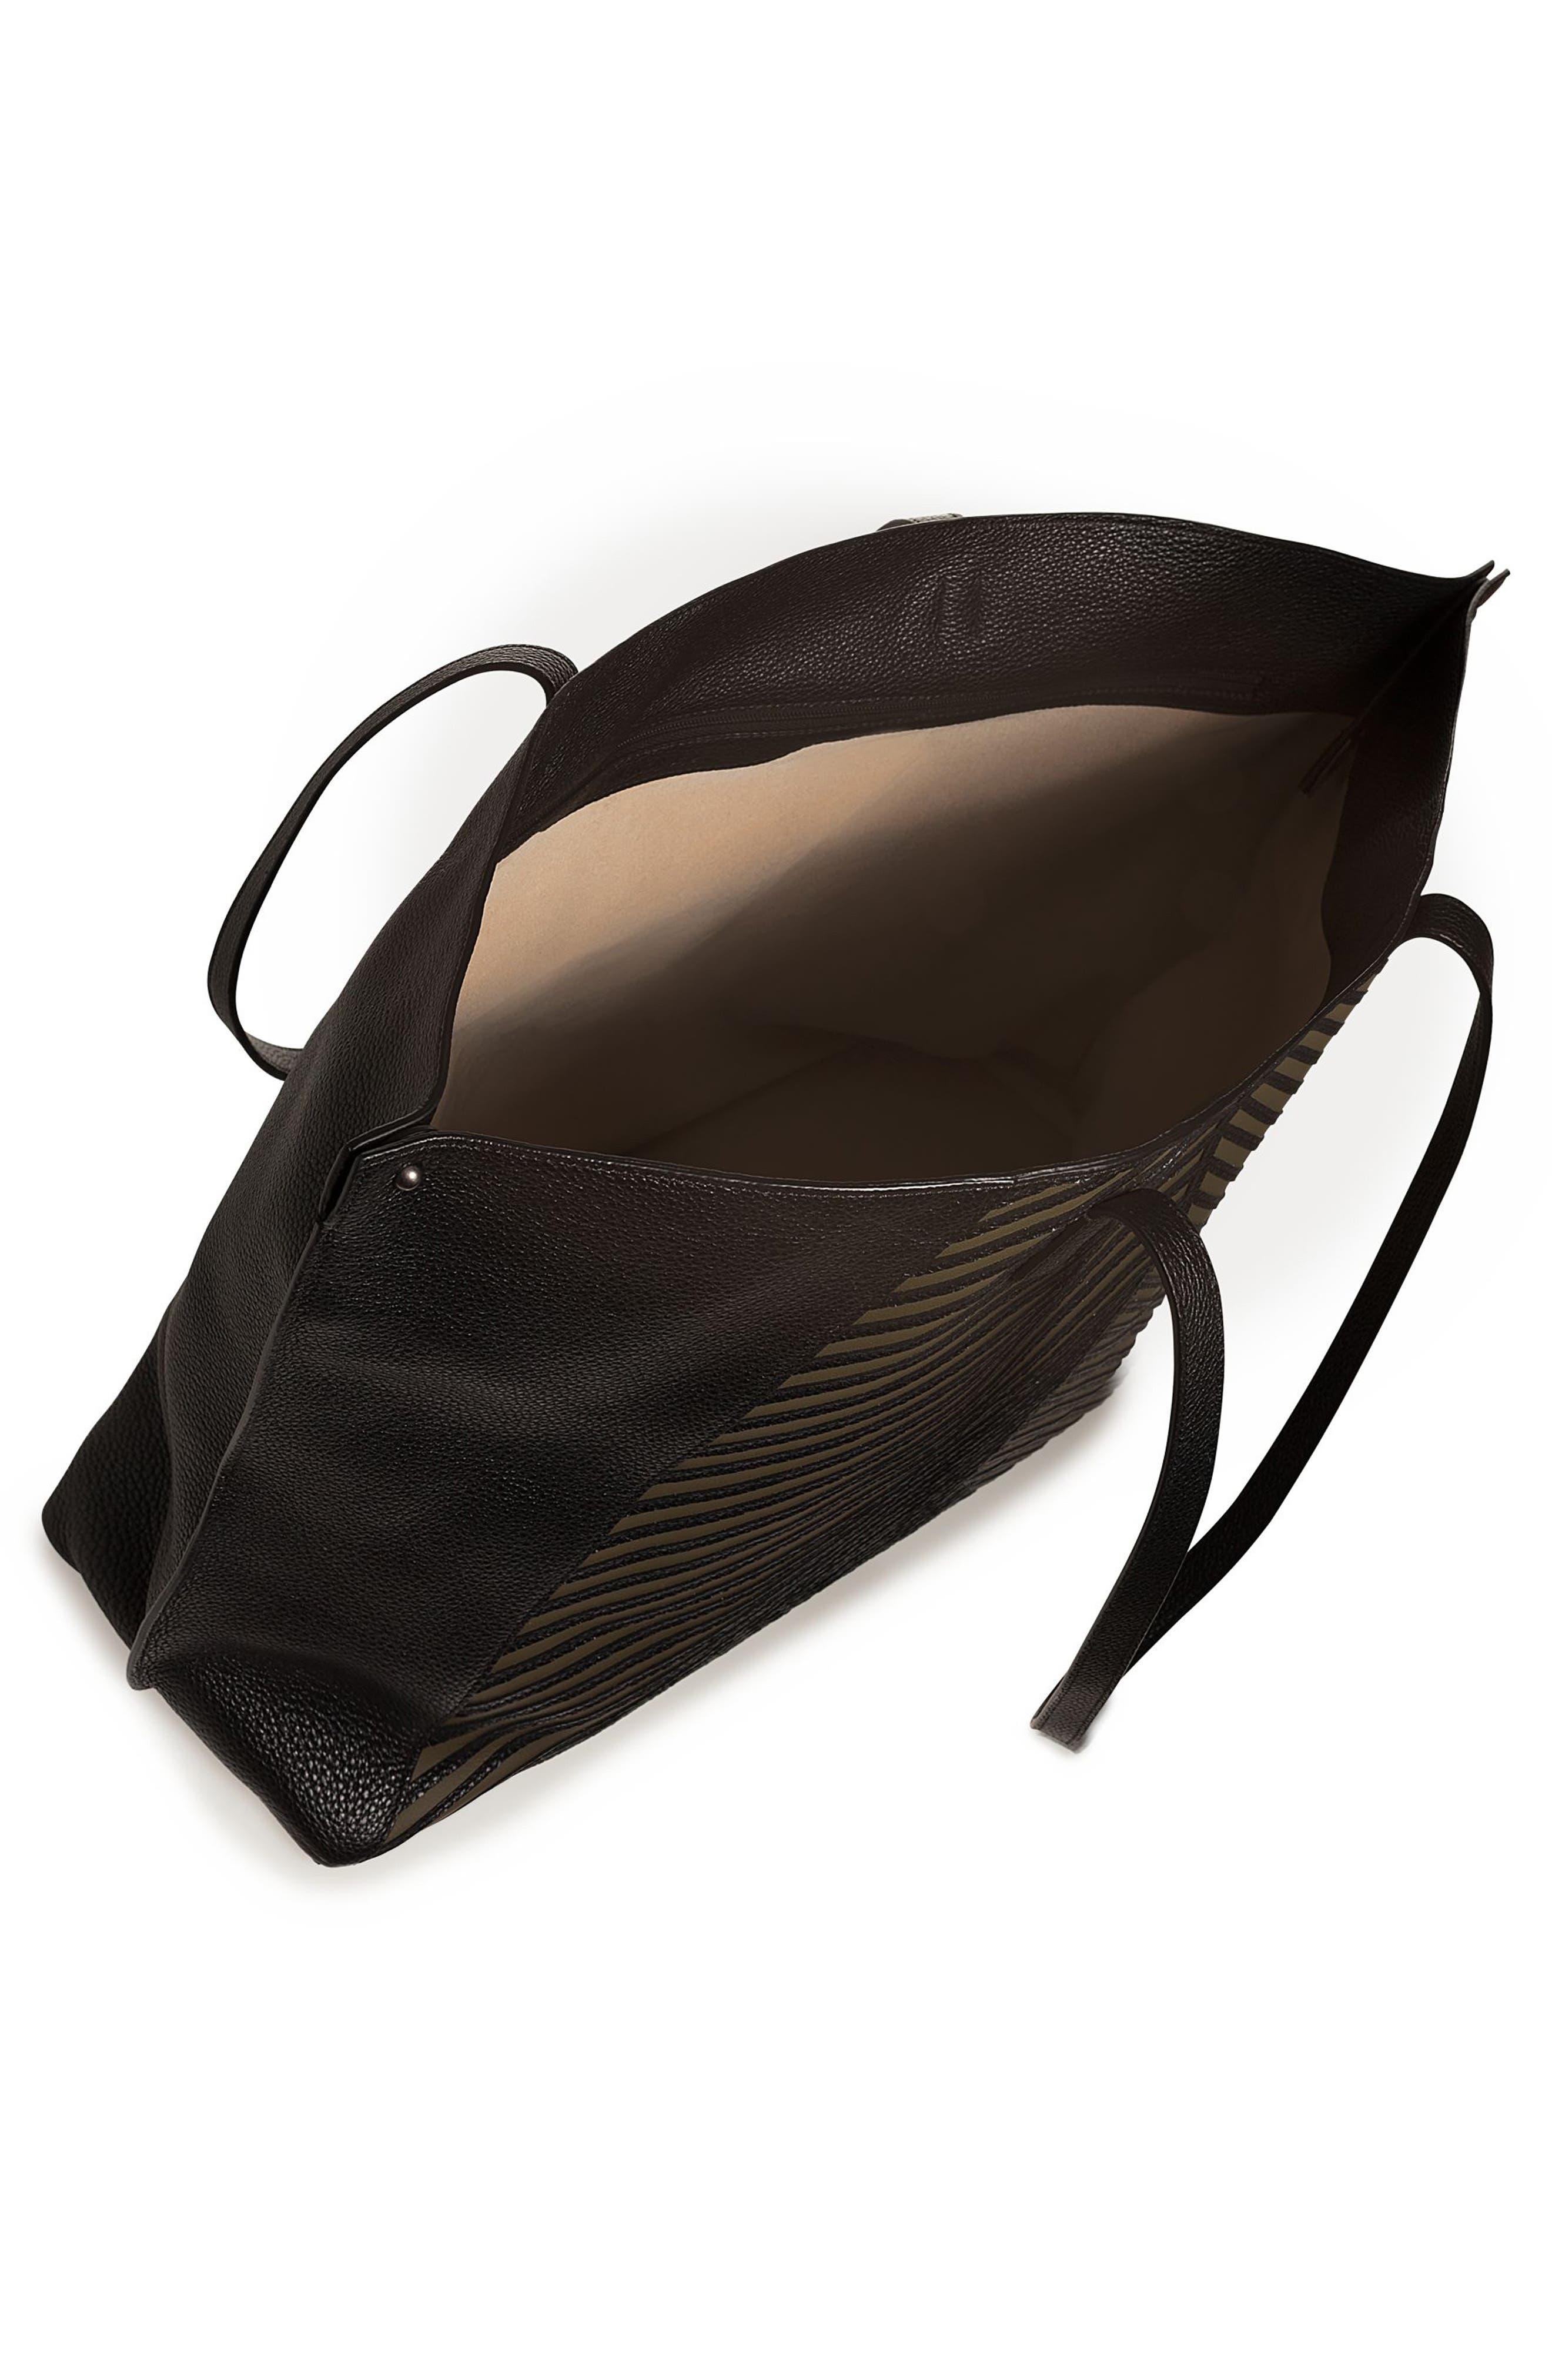 Medium AI Leather Tote,                             Alternate thumbnail 3, color,                             Olive/ Black